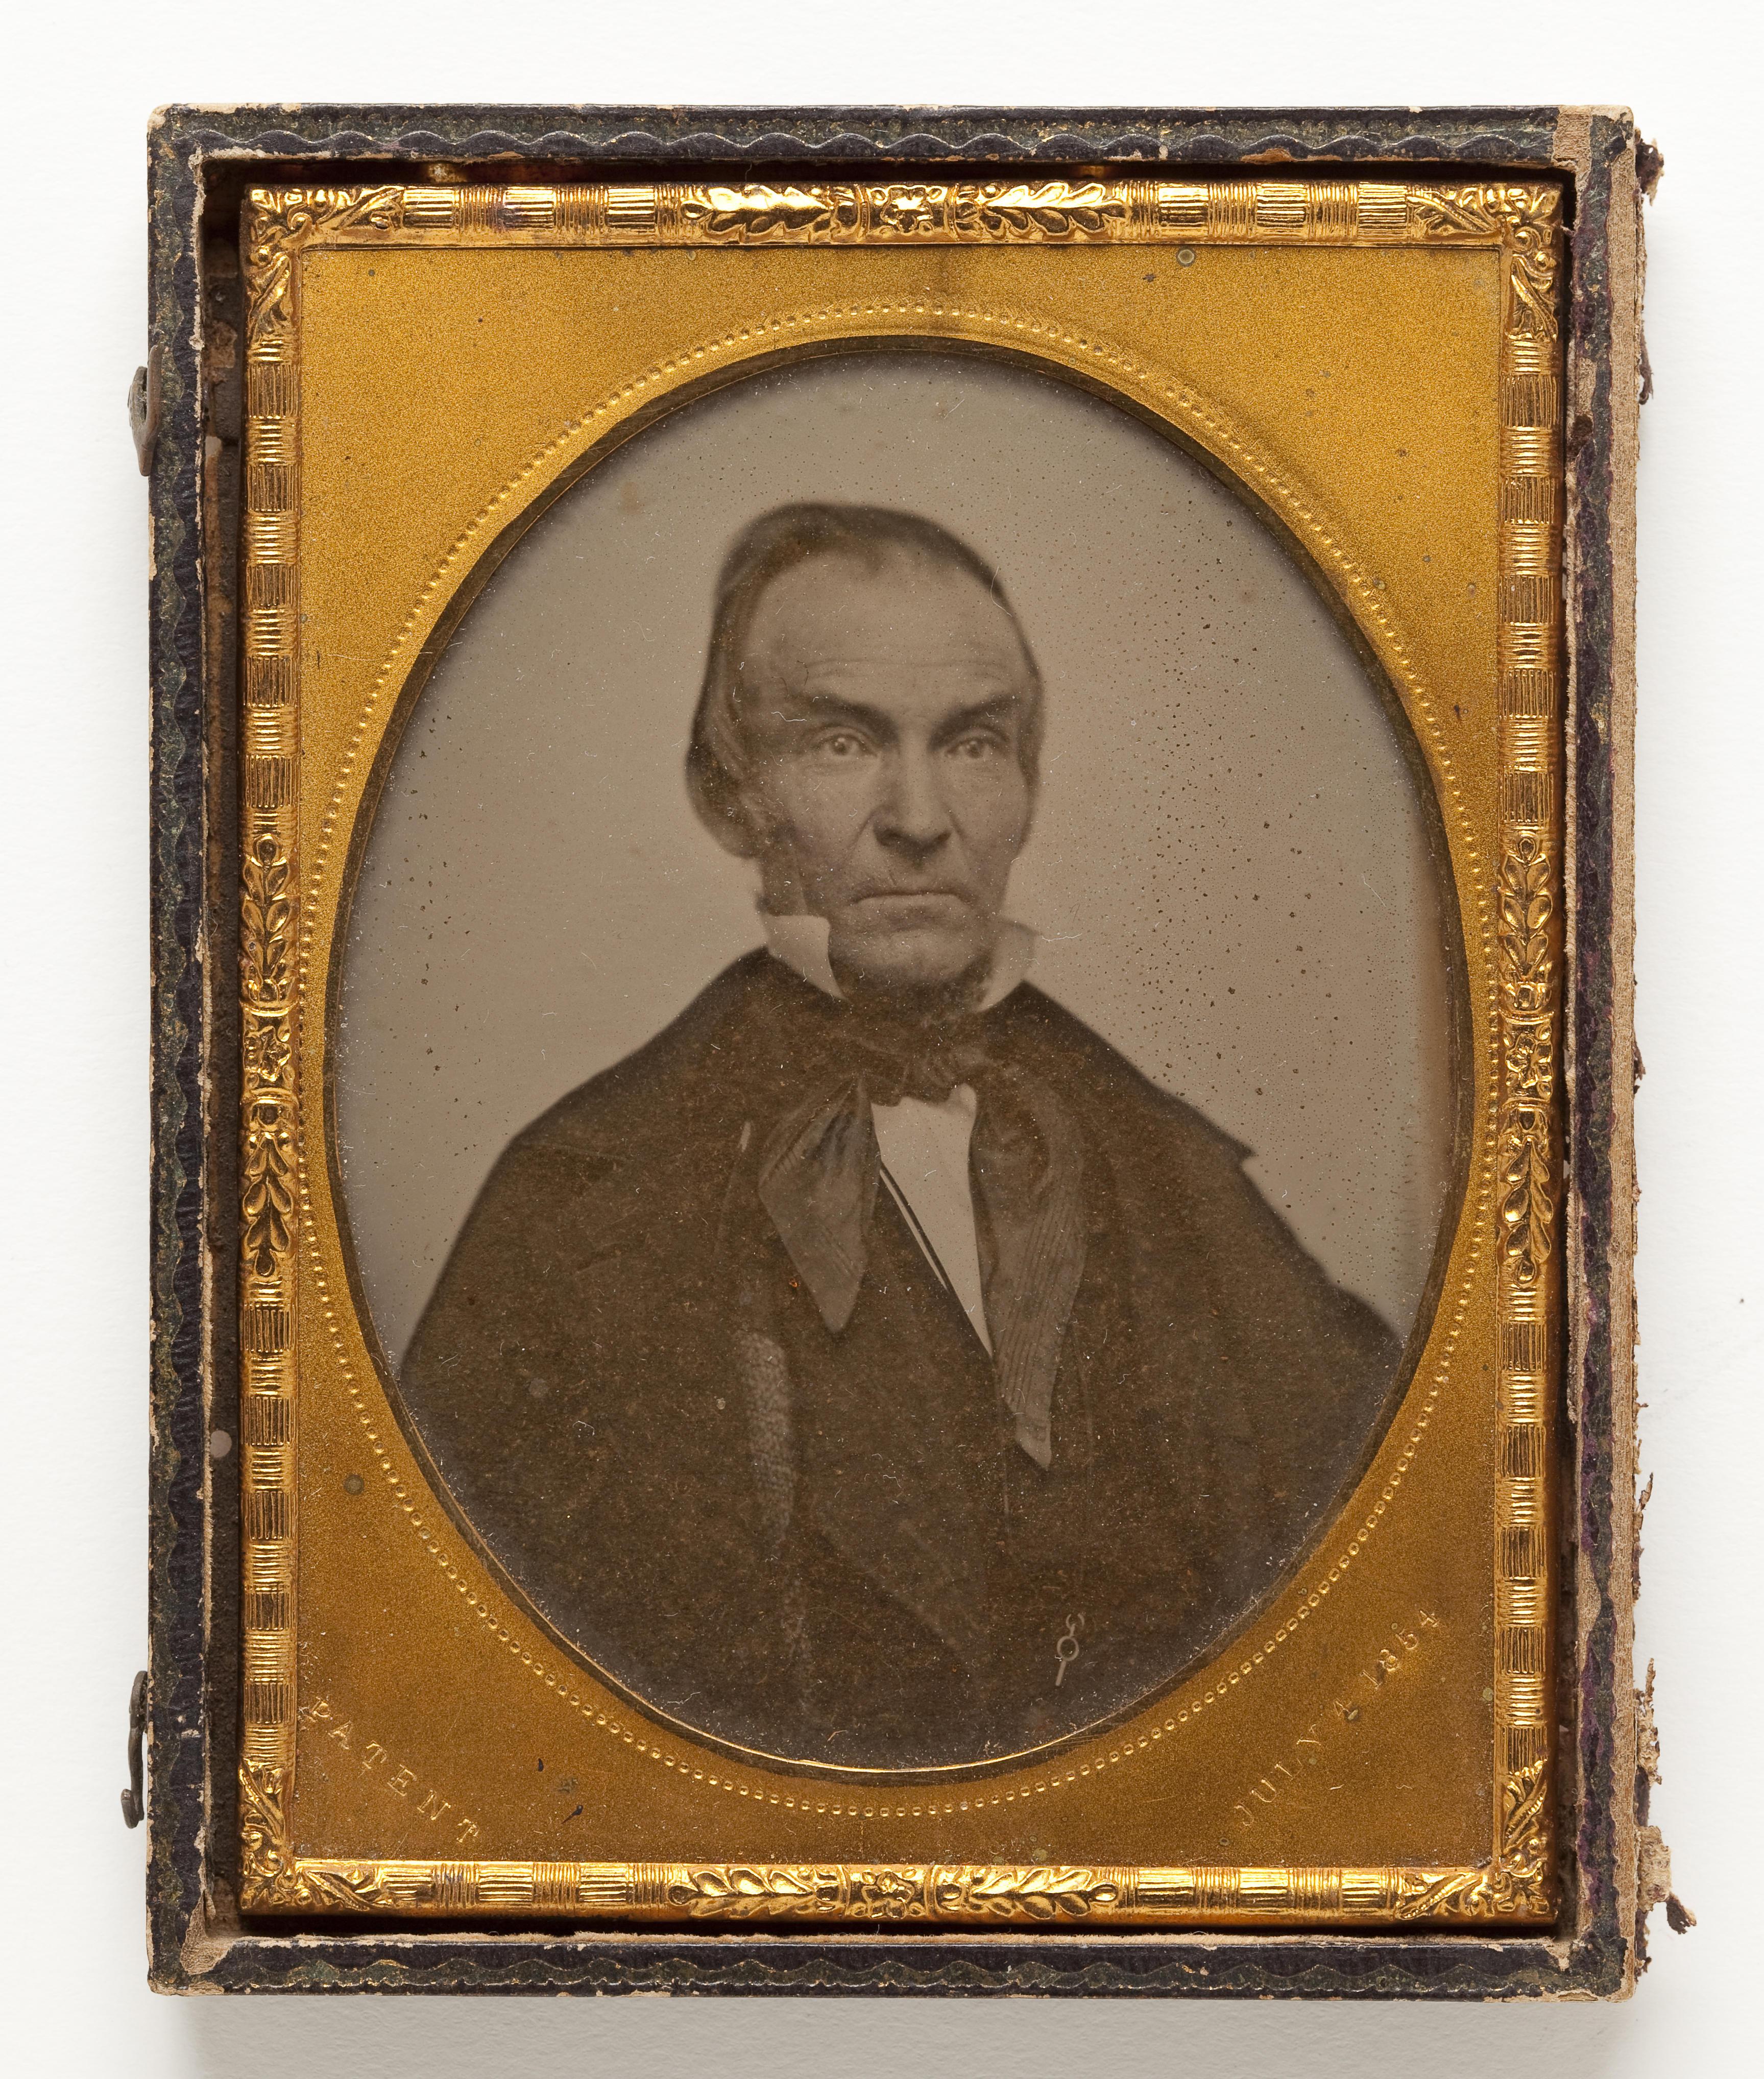 File:Dwight Baldwin, ambrotype, 1854.jpg - Wikimedia Commons